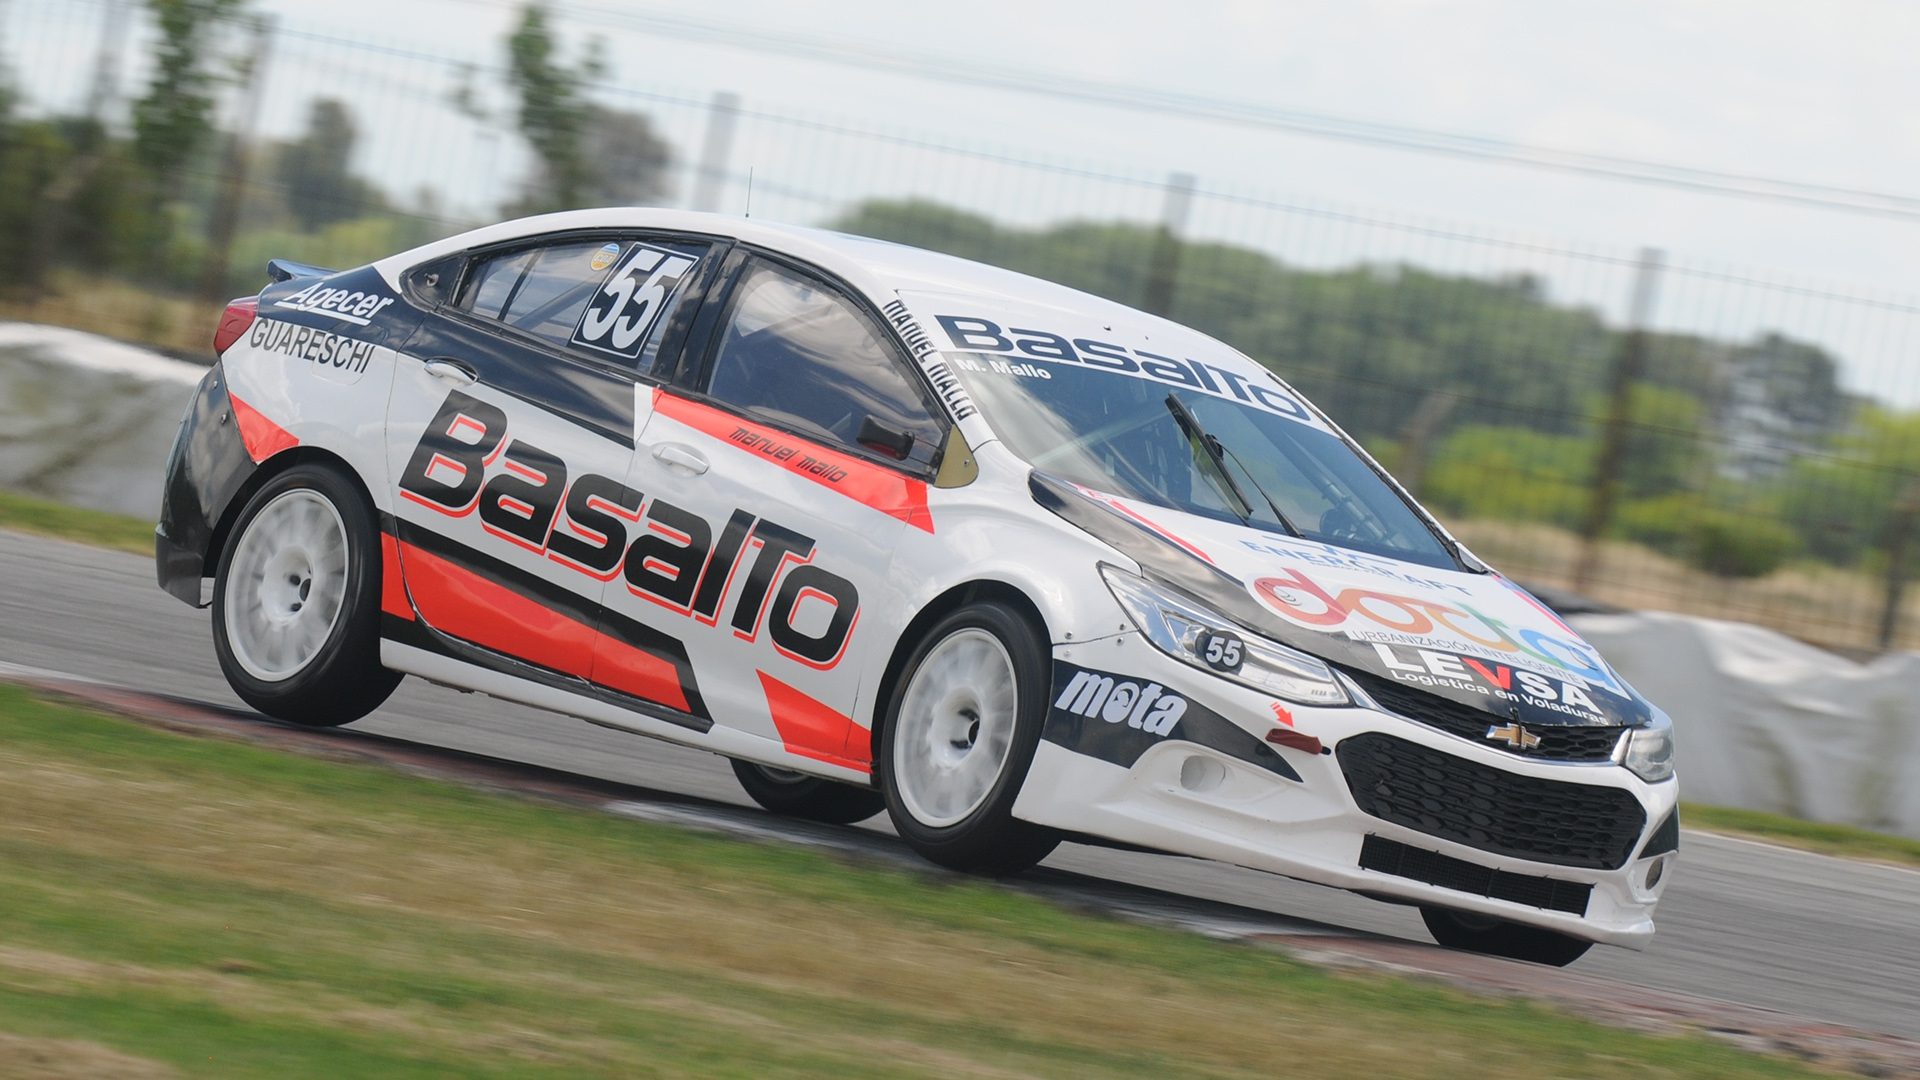 Manuel Mallo logra su primera pole position